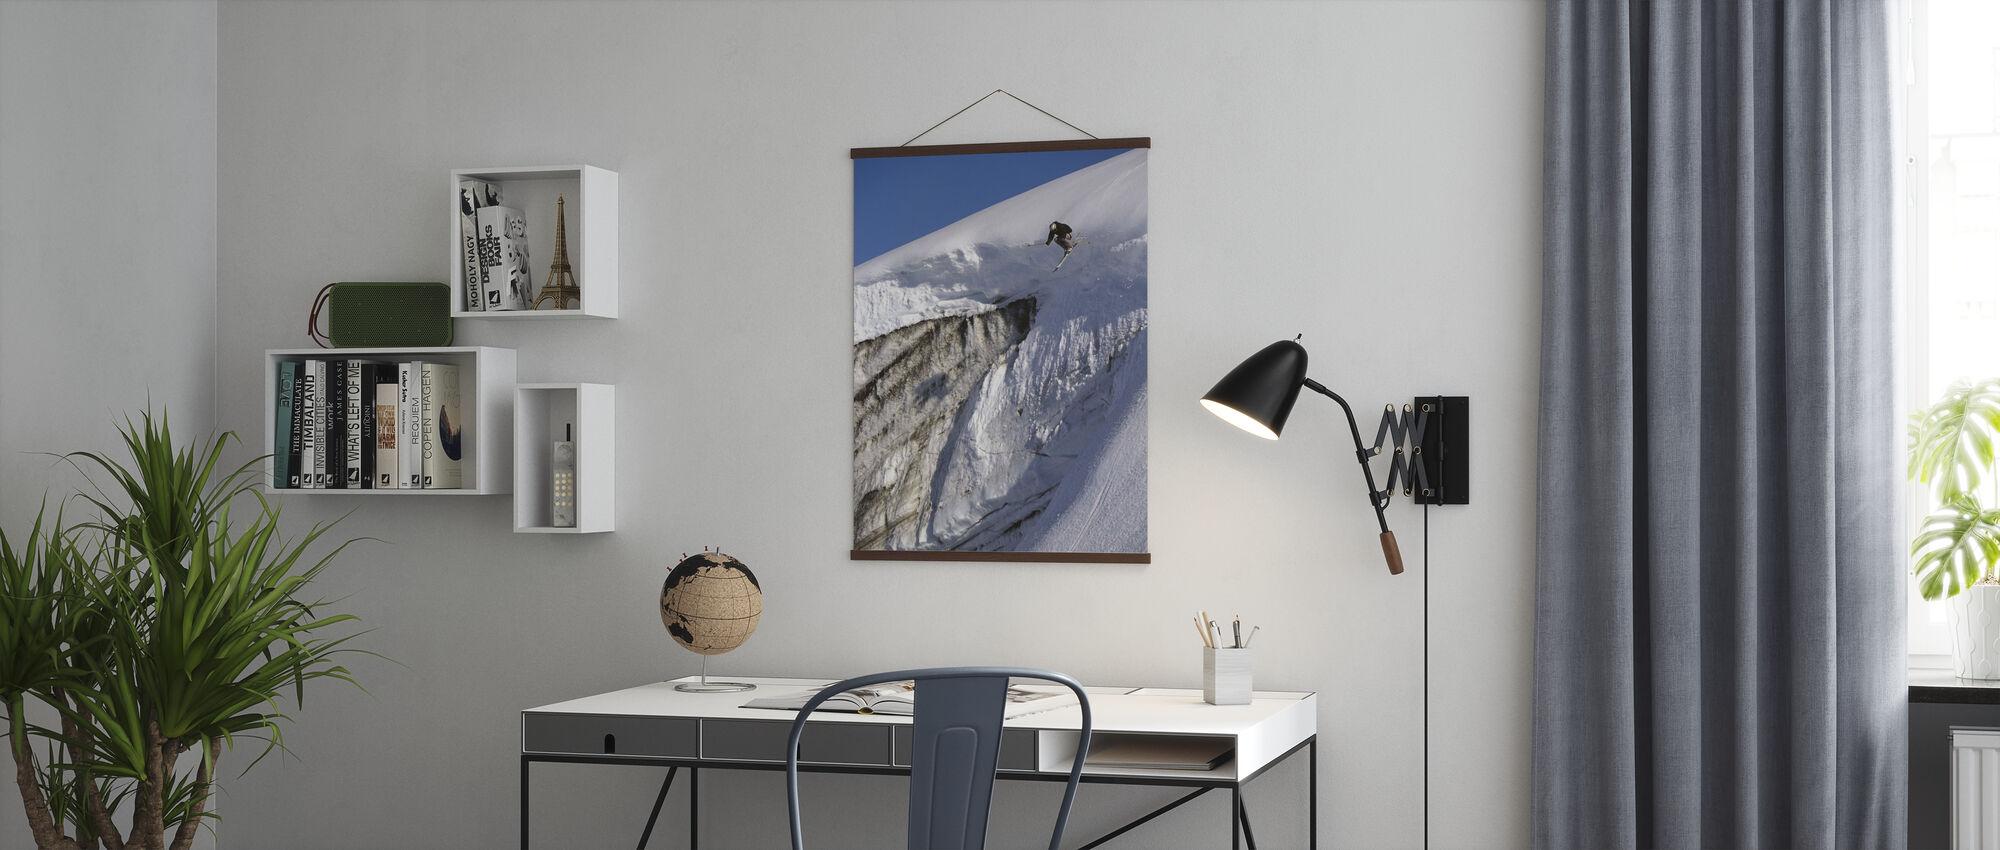 Sciare sul ghiacciaio Apussuit - Poster - Uffici